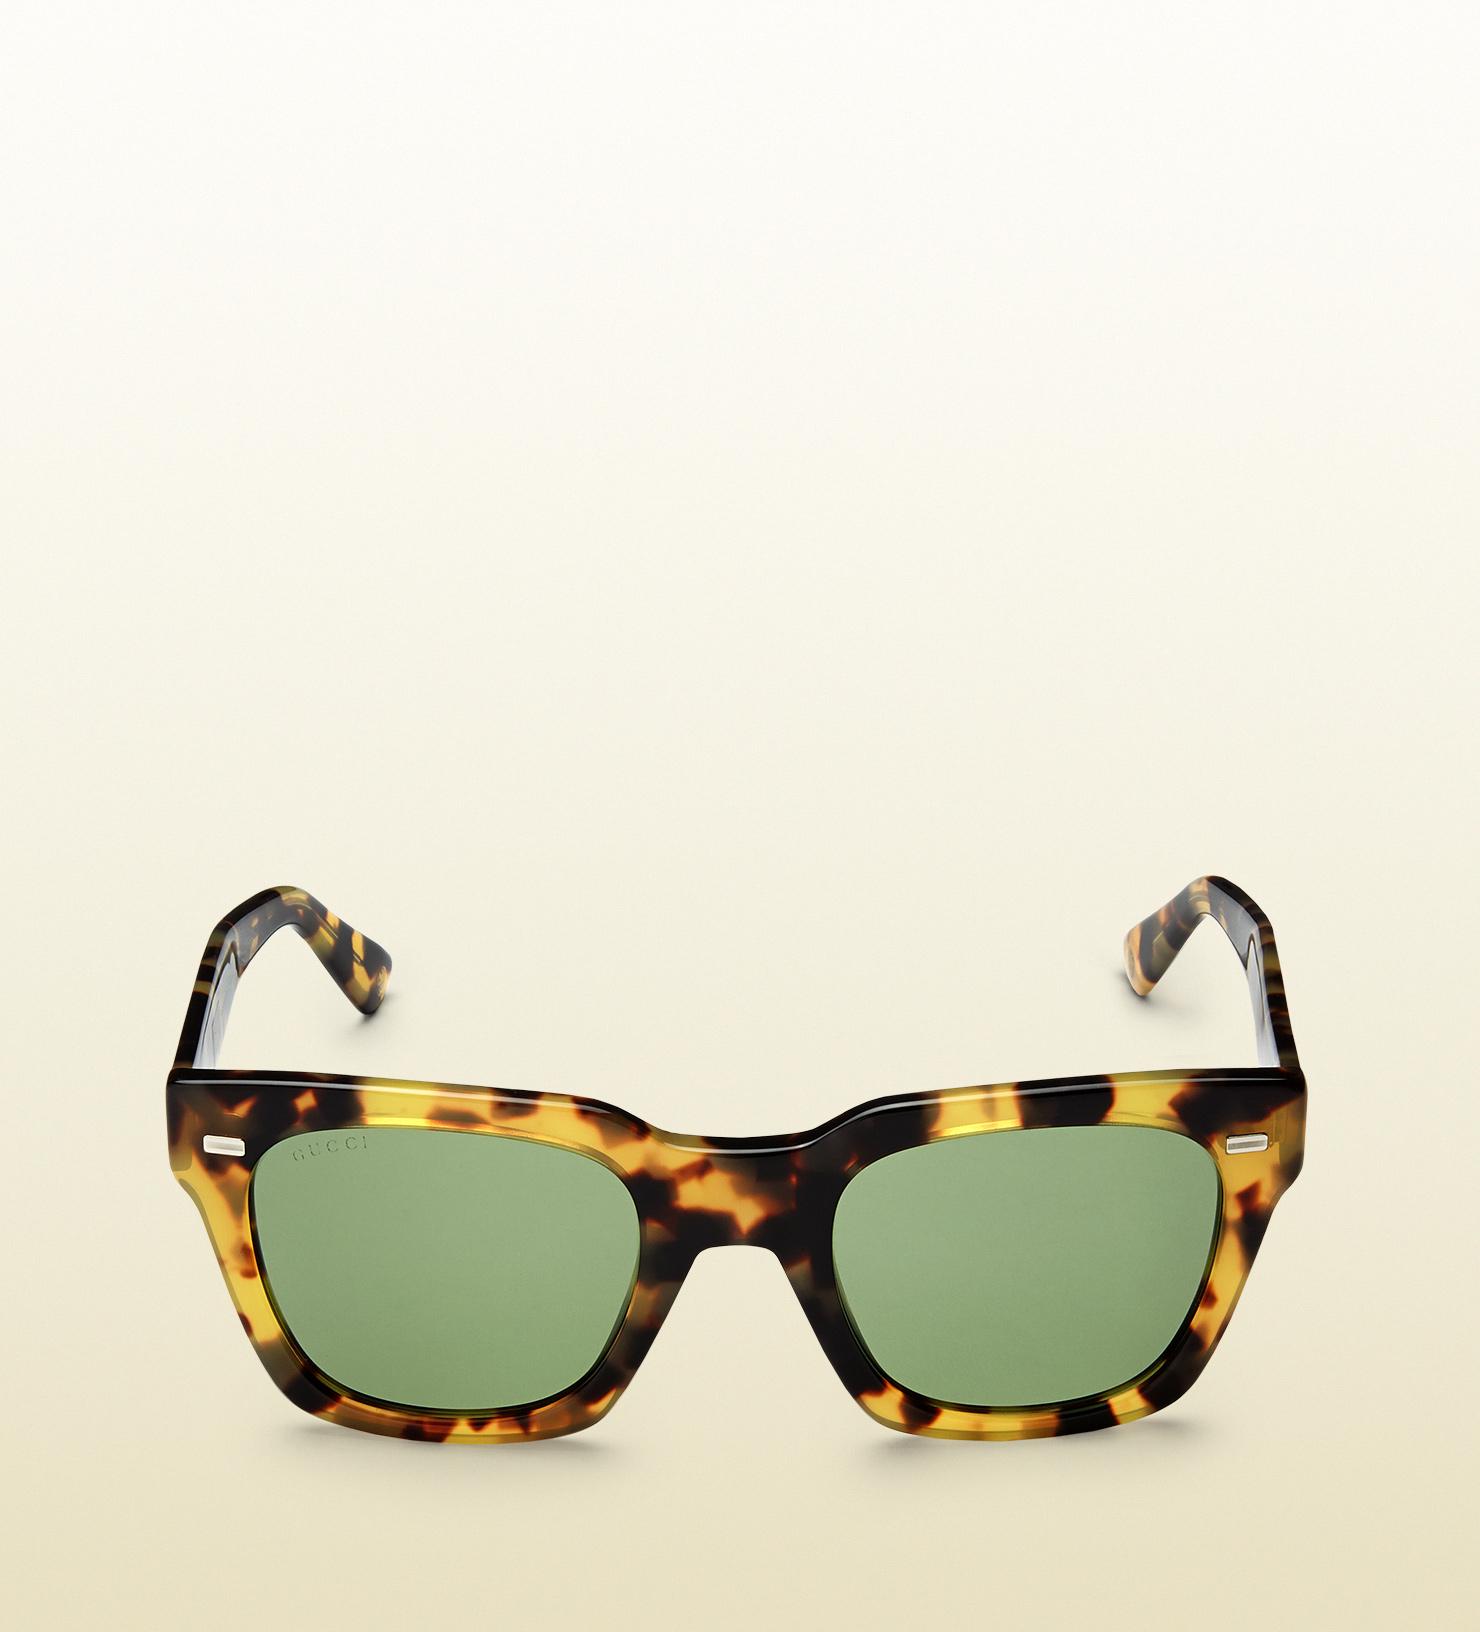 Havana Tortoiseshell Sunglasses Gucci UiNDwTcXE4